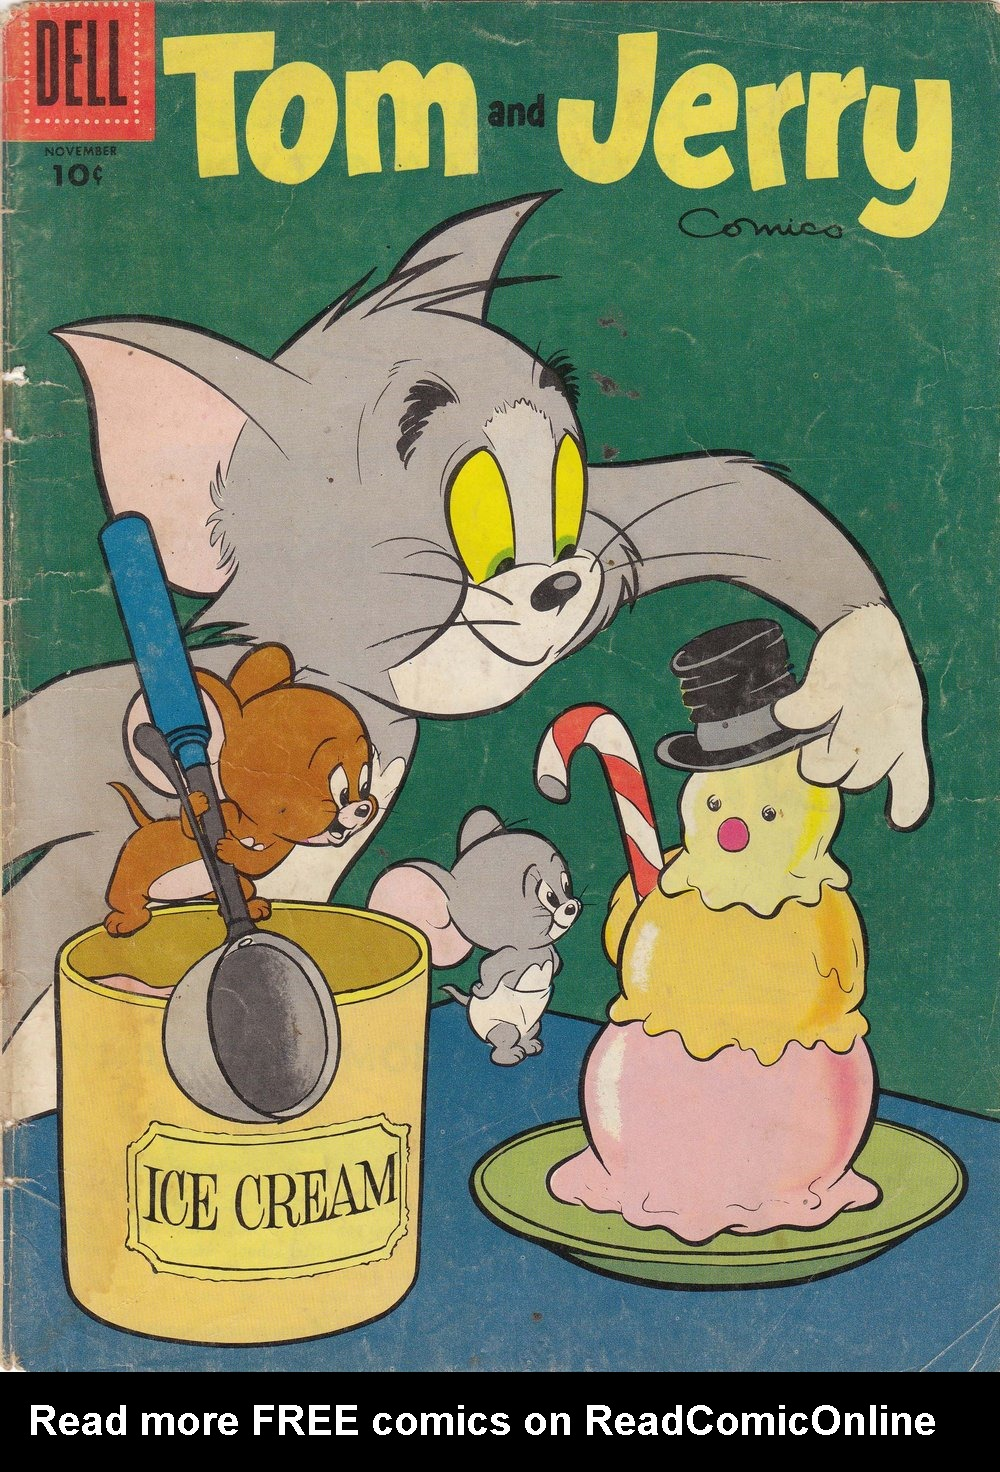 Tom & Jerry Comics 136 Page 1